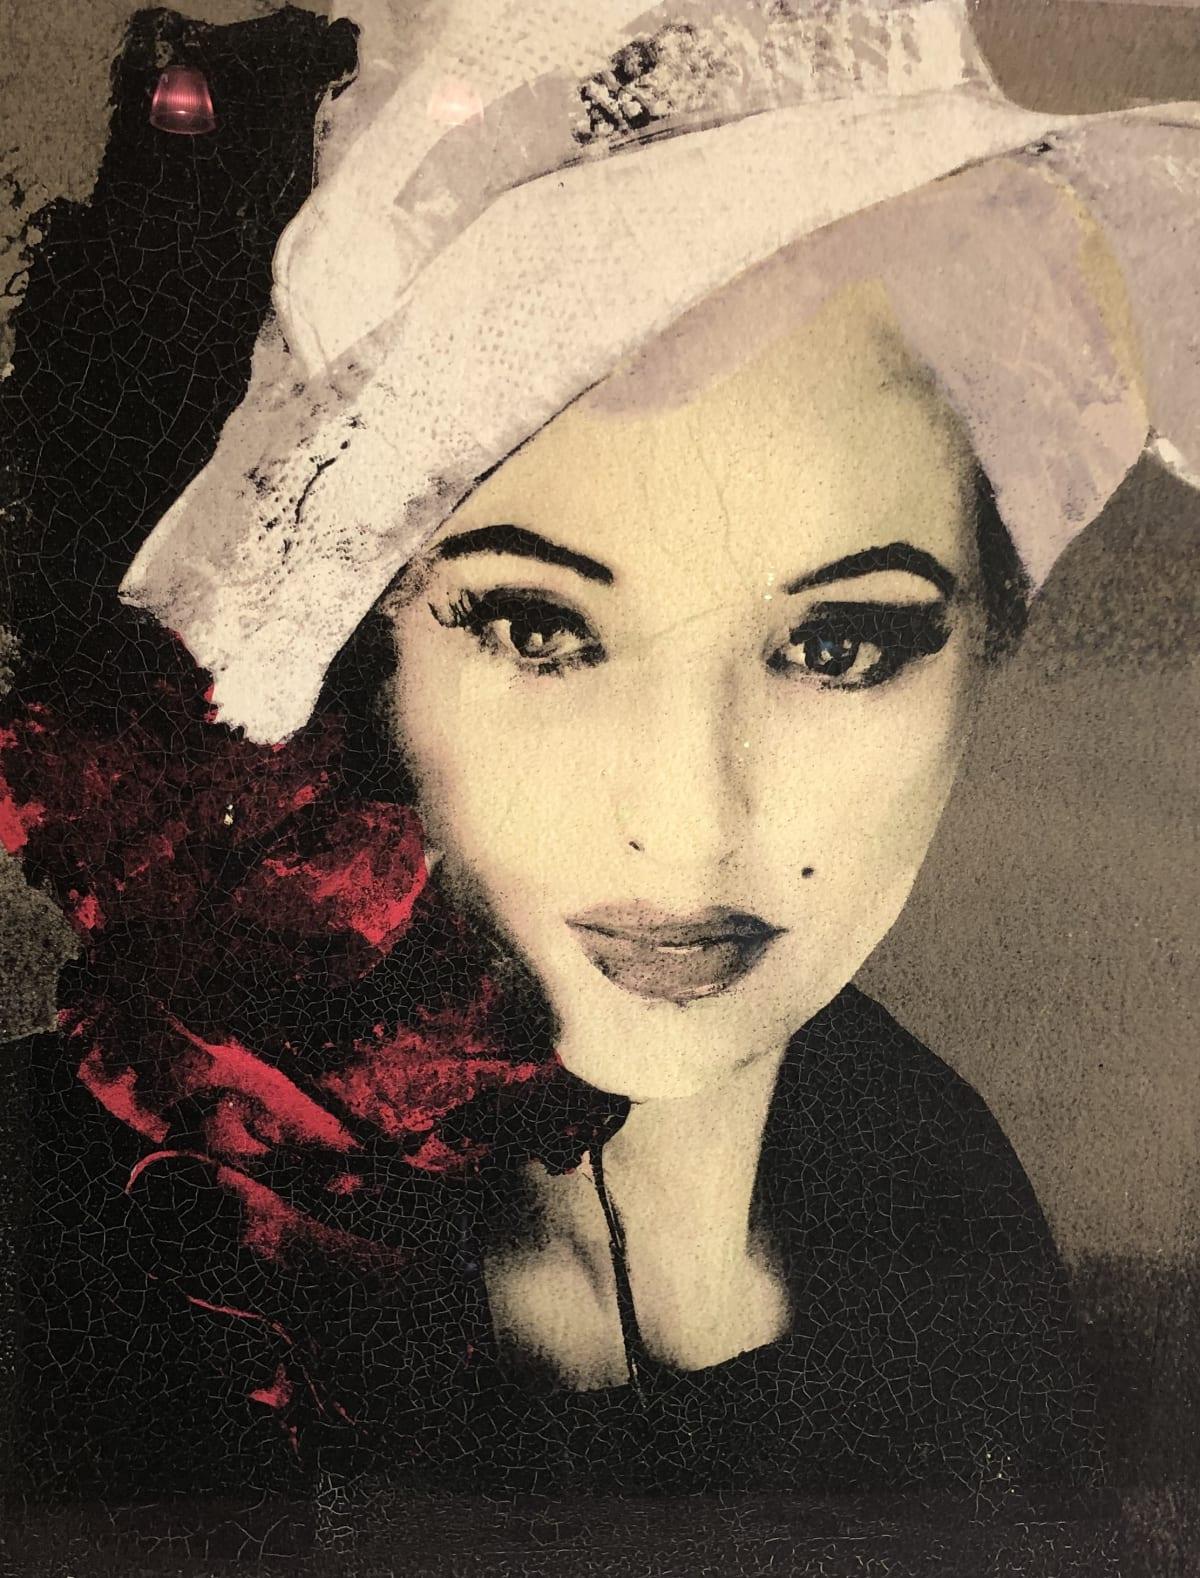 Lita Cabellut, Marilyn Monroe - I